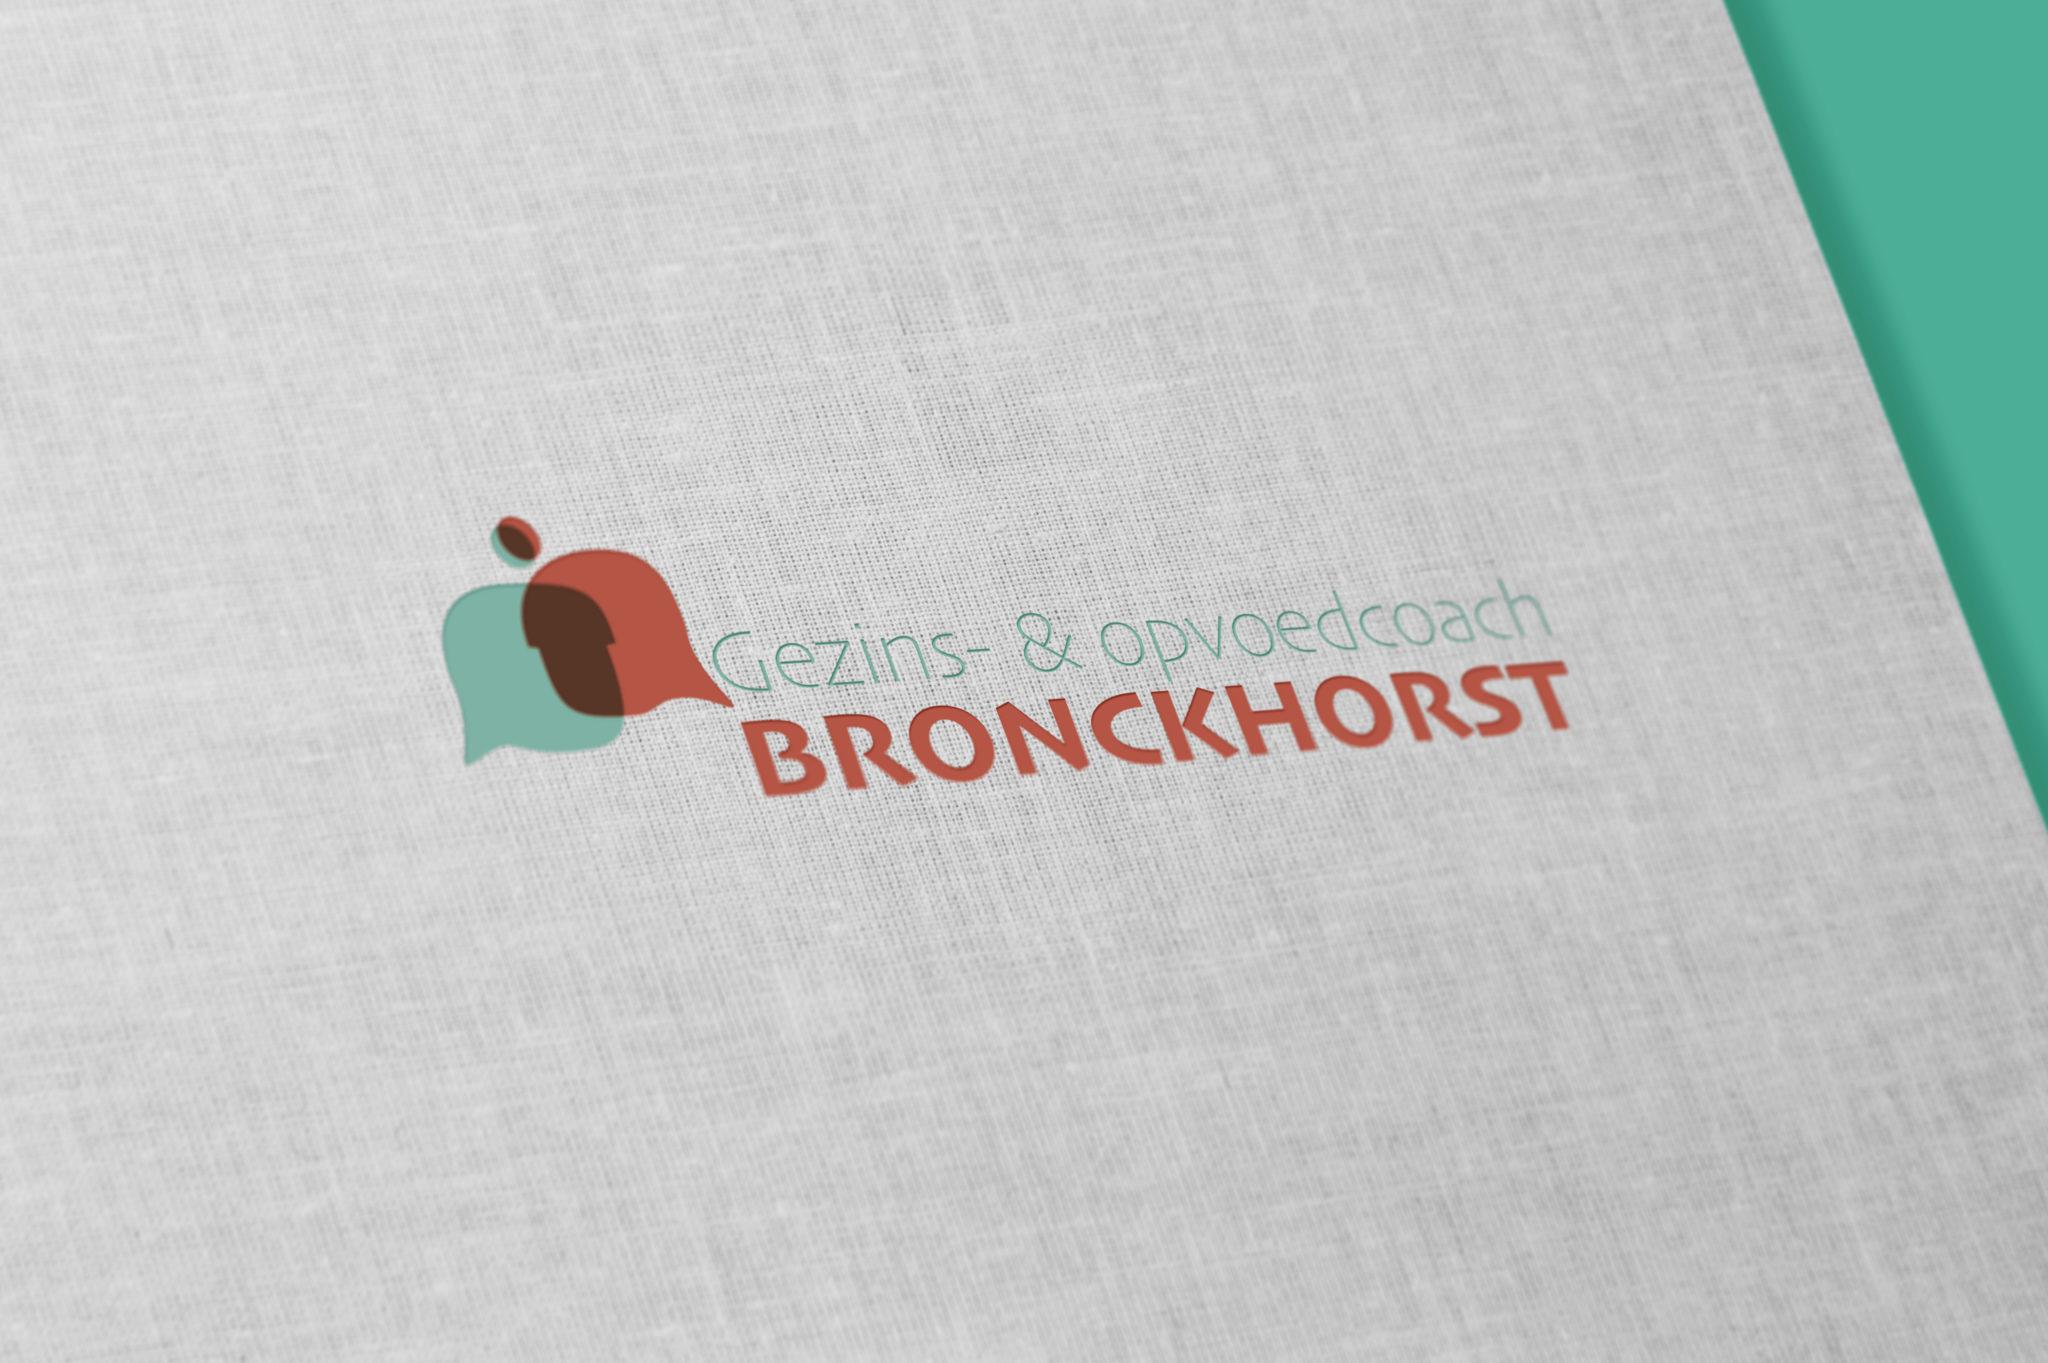 Bronckhorst logo ontwerp